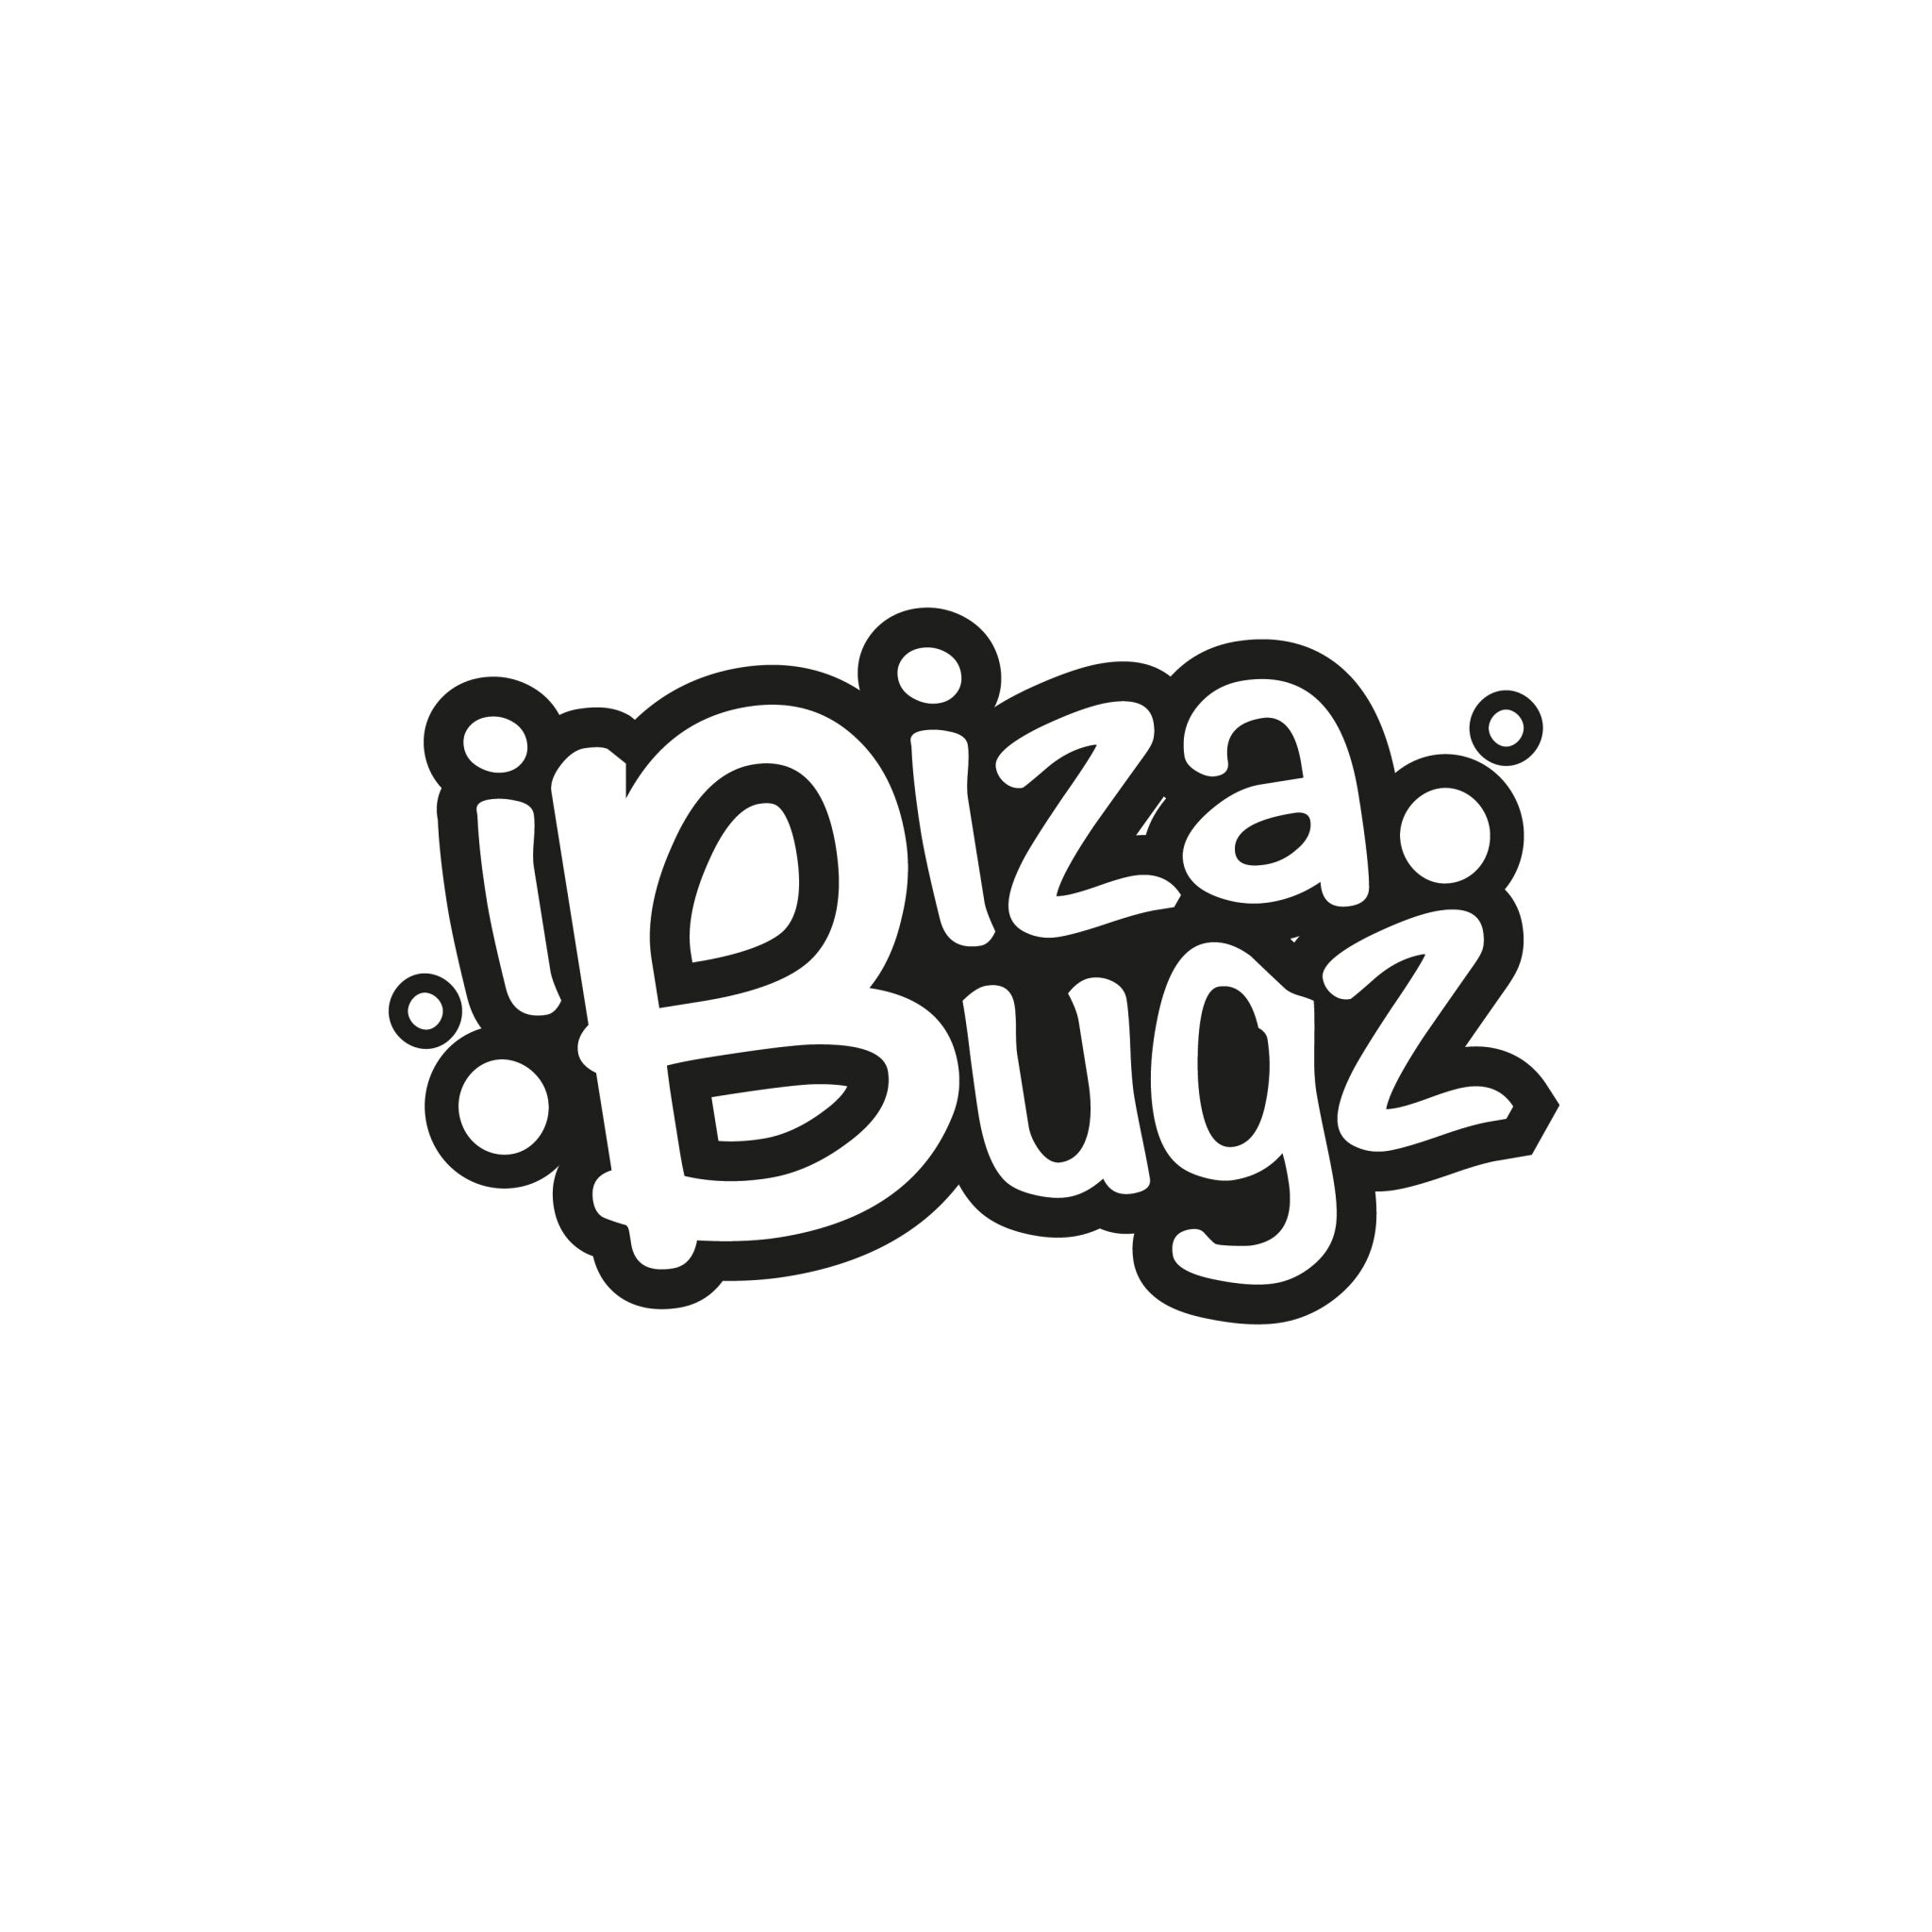 Ibiza Bugs